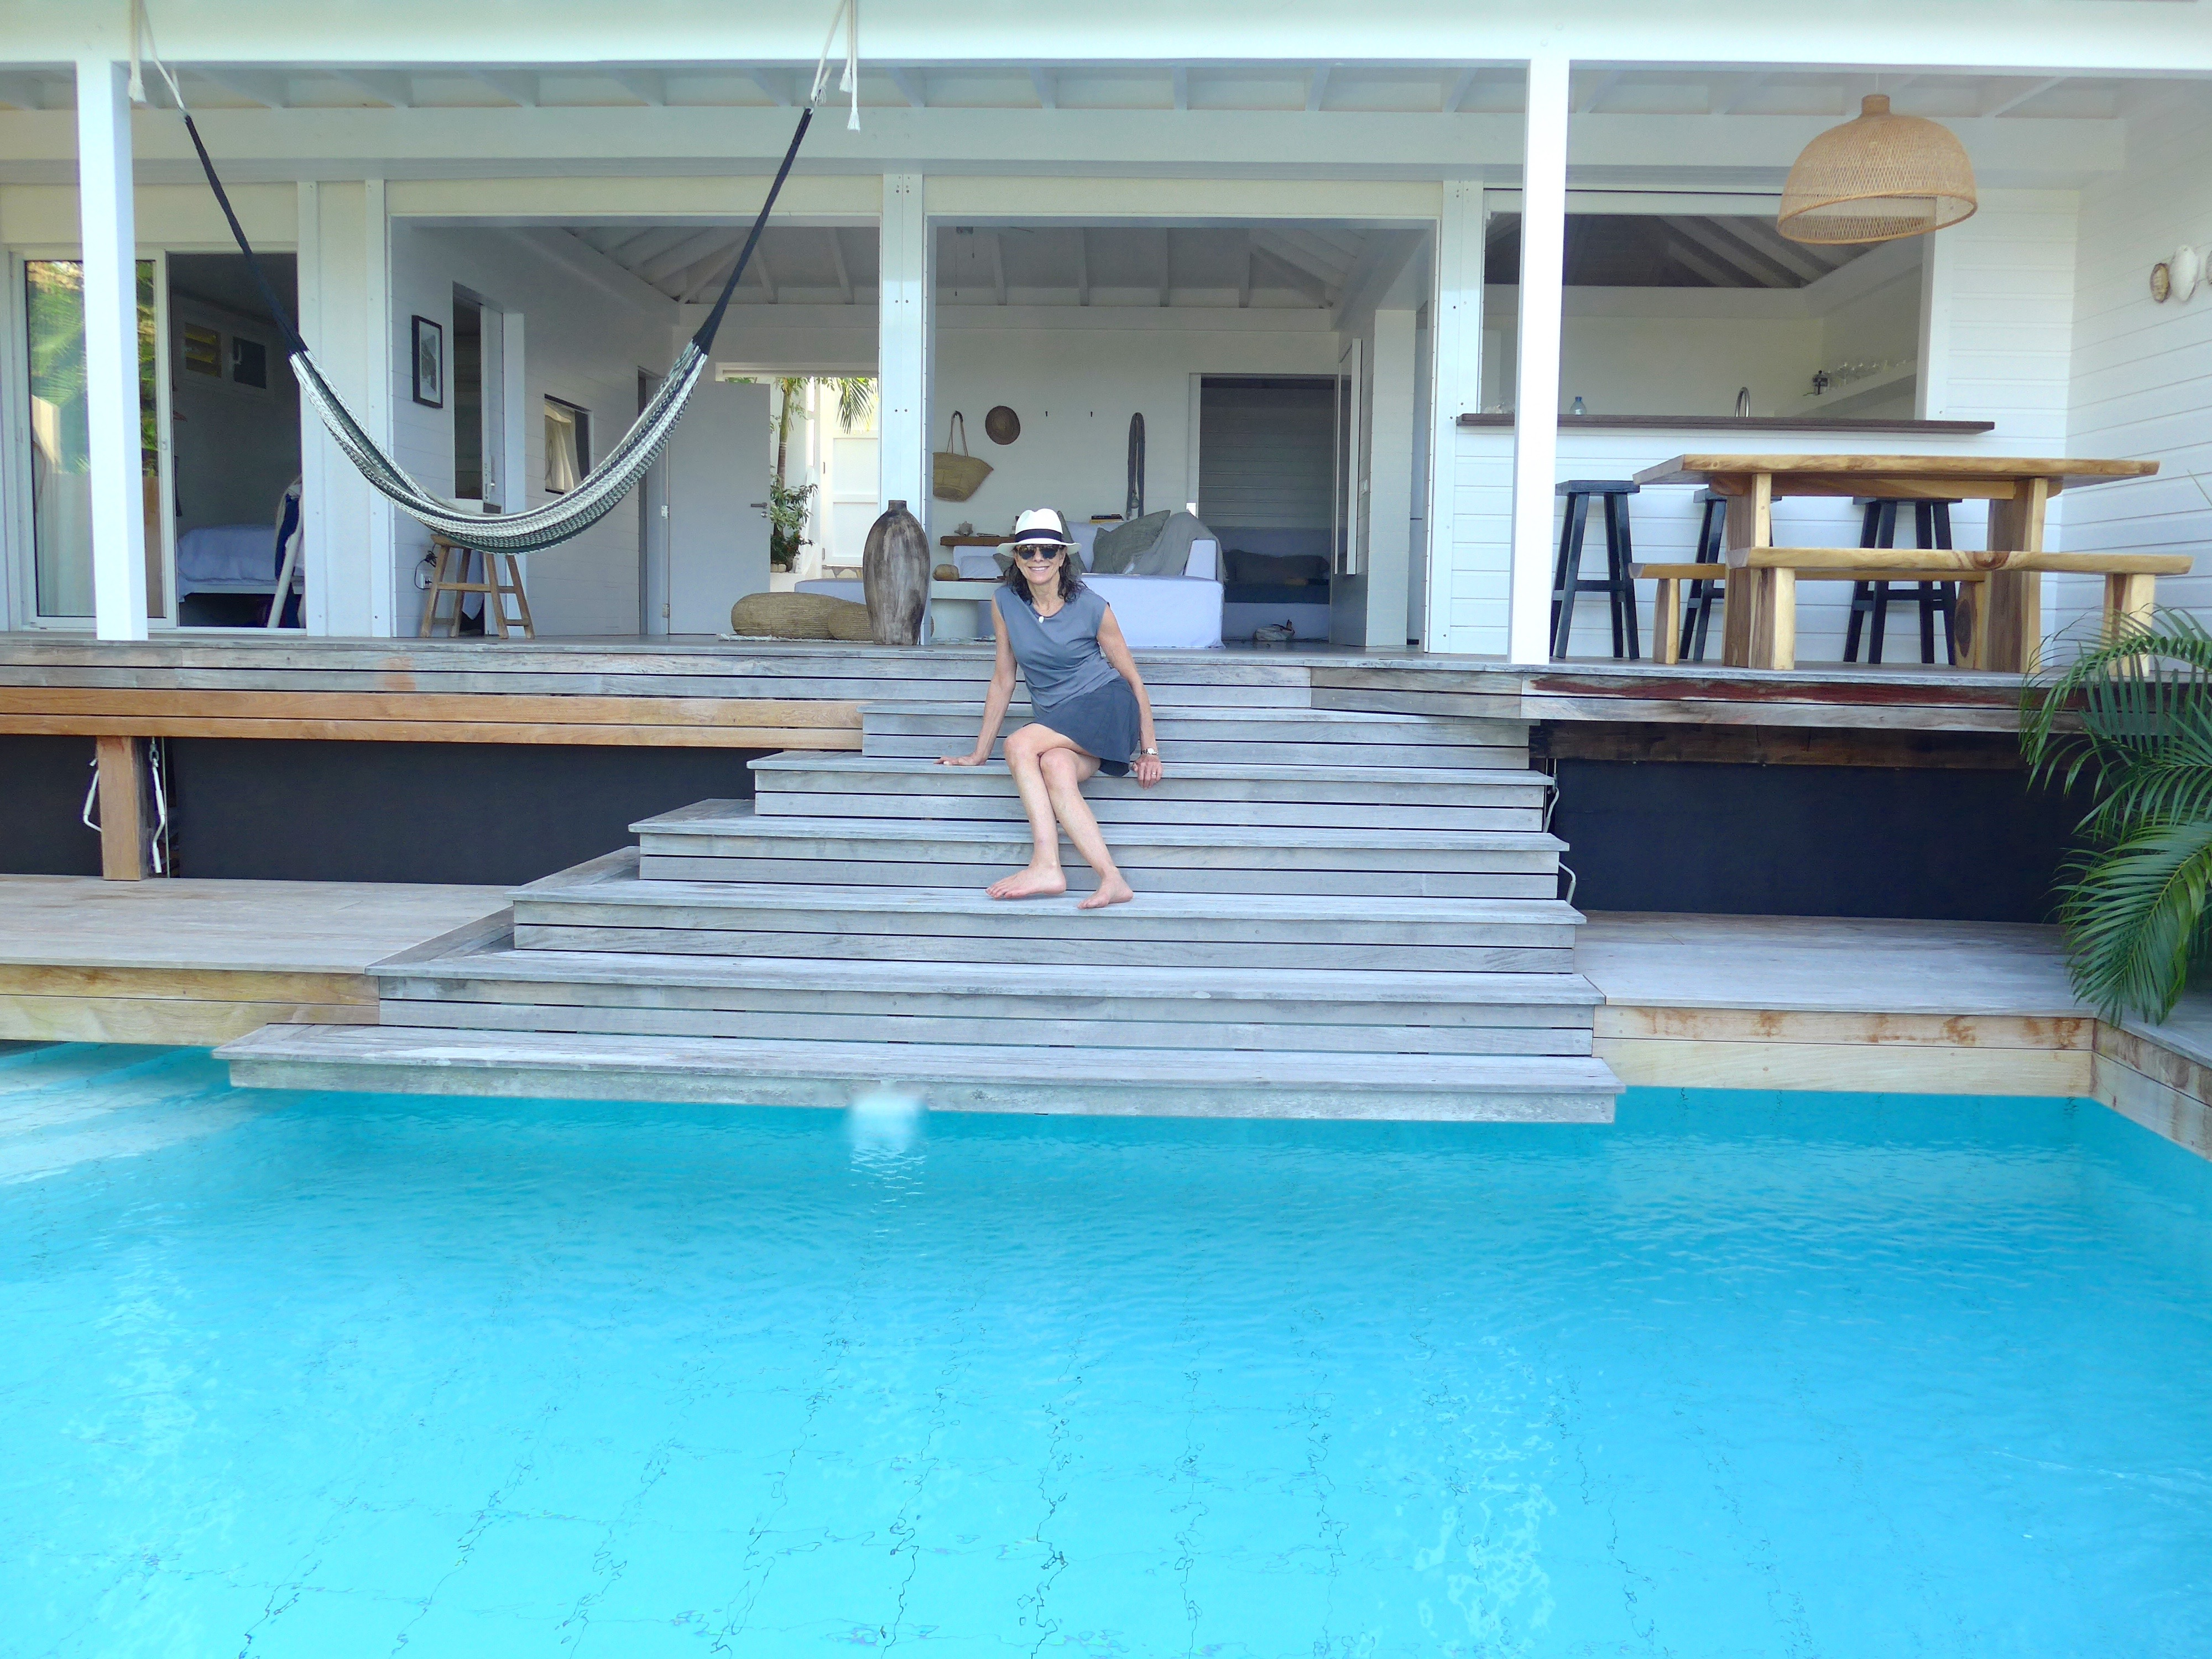 Villa Palmier, St. Barts